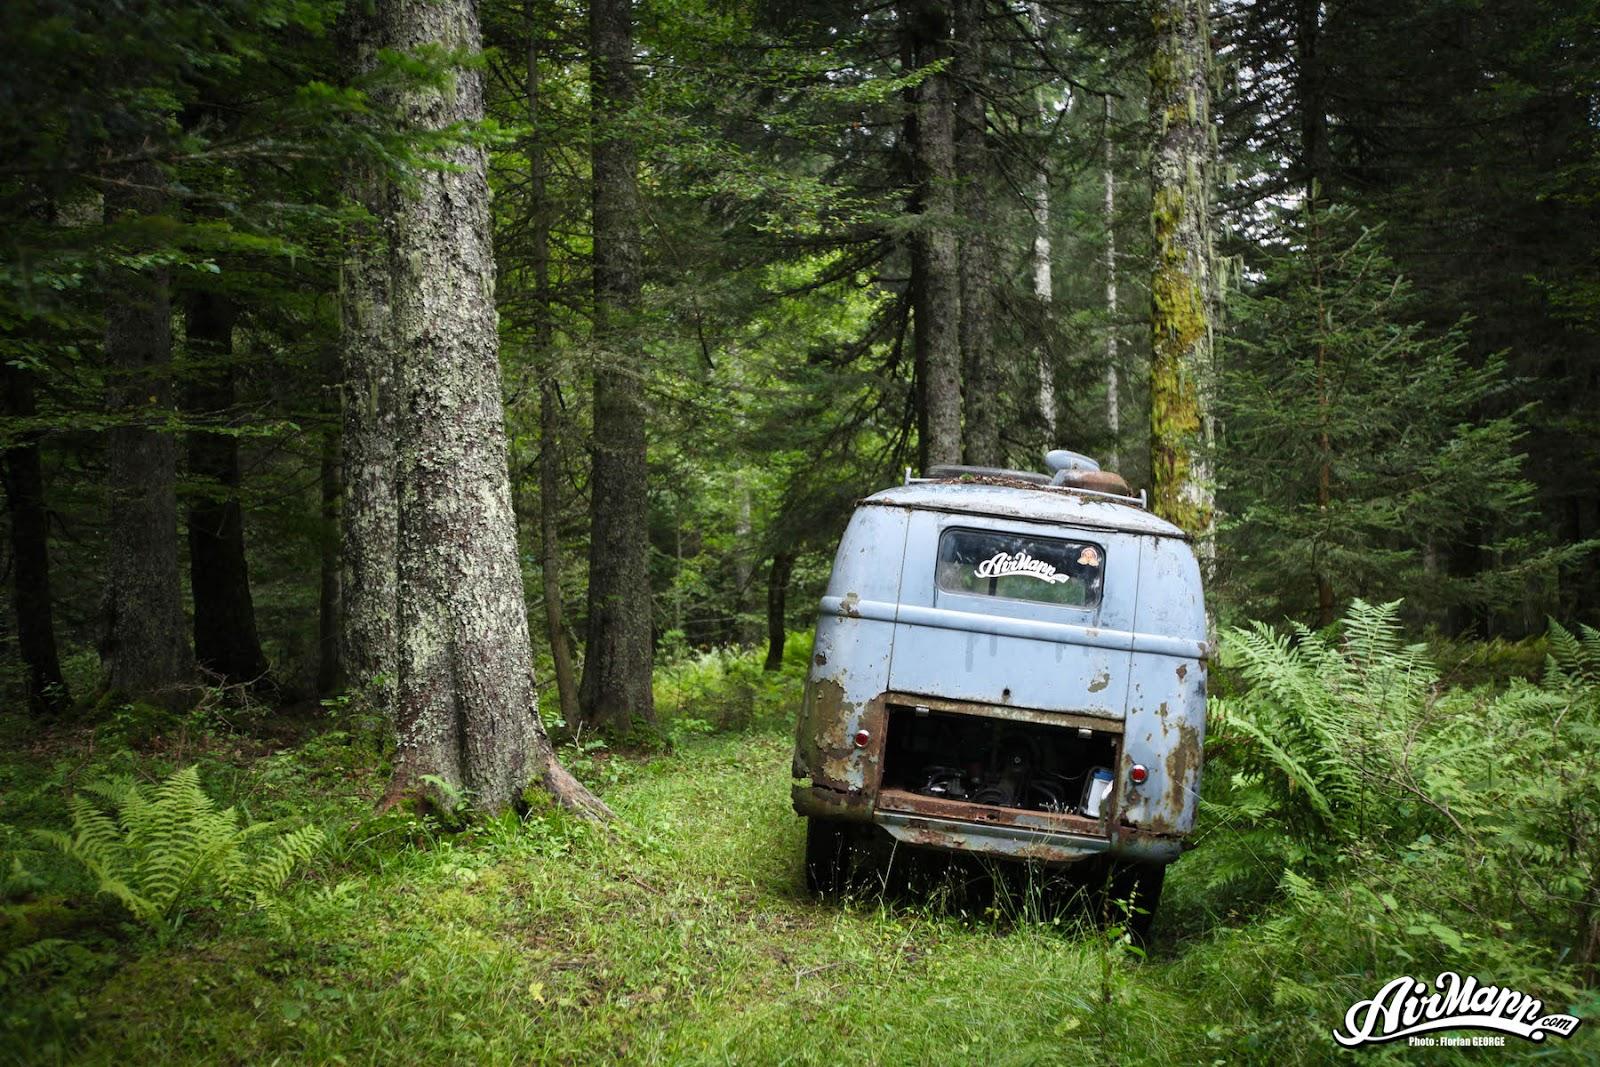 vw2Bmicrobus1 Η απίστευτη ιστορία ενός VW που δούλεψε μετά από 40 χρόνια Caber Van, Camper Van, Fun, VAN, videos, Volkswagen, Volkswagen Microbus, VW, VW Panelvan, VW Transporter, zblog